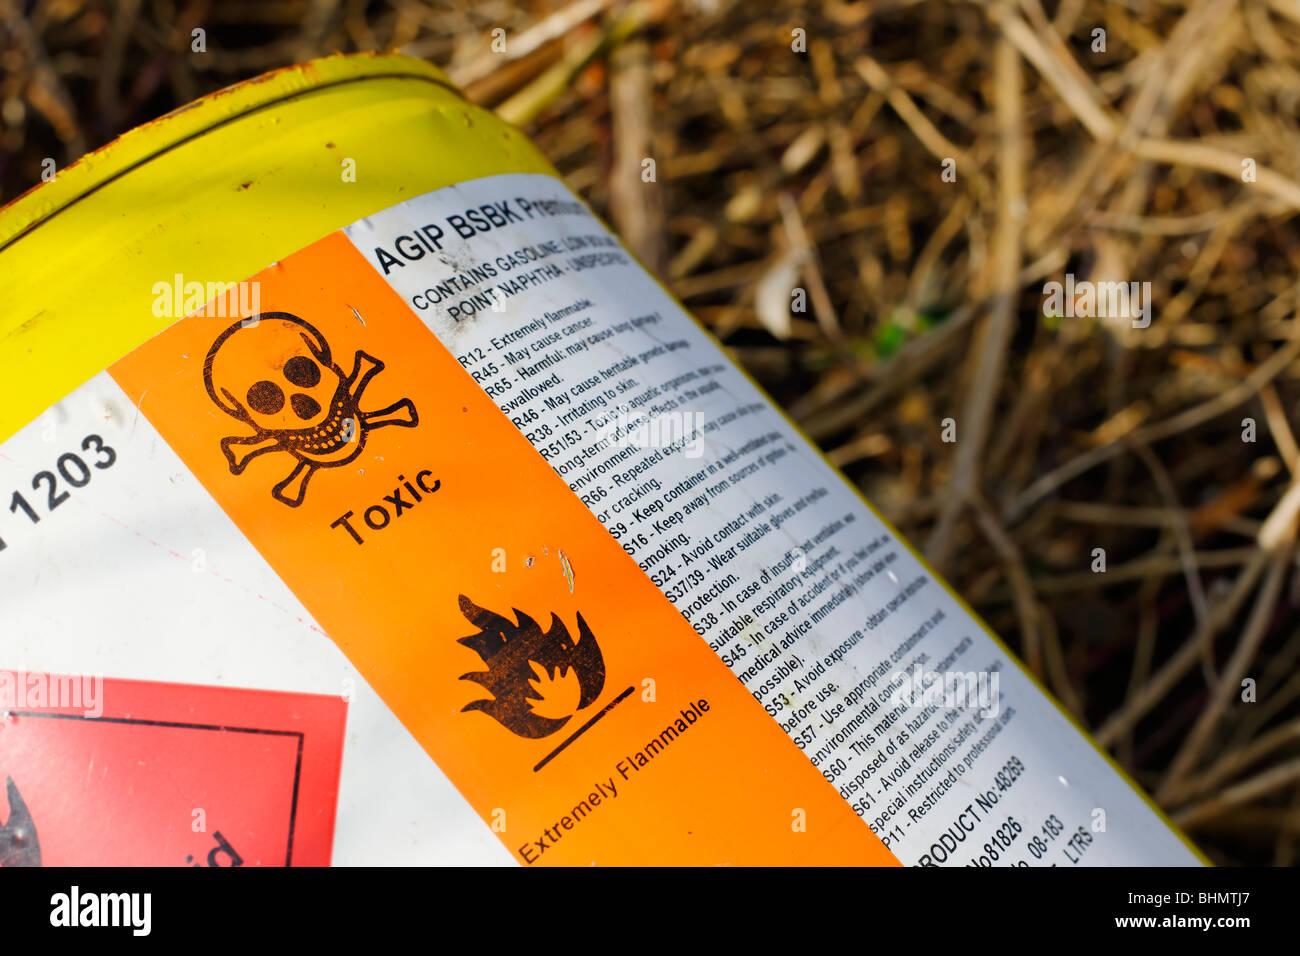 Toxic - Stock Image